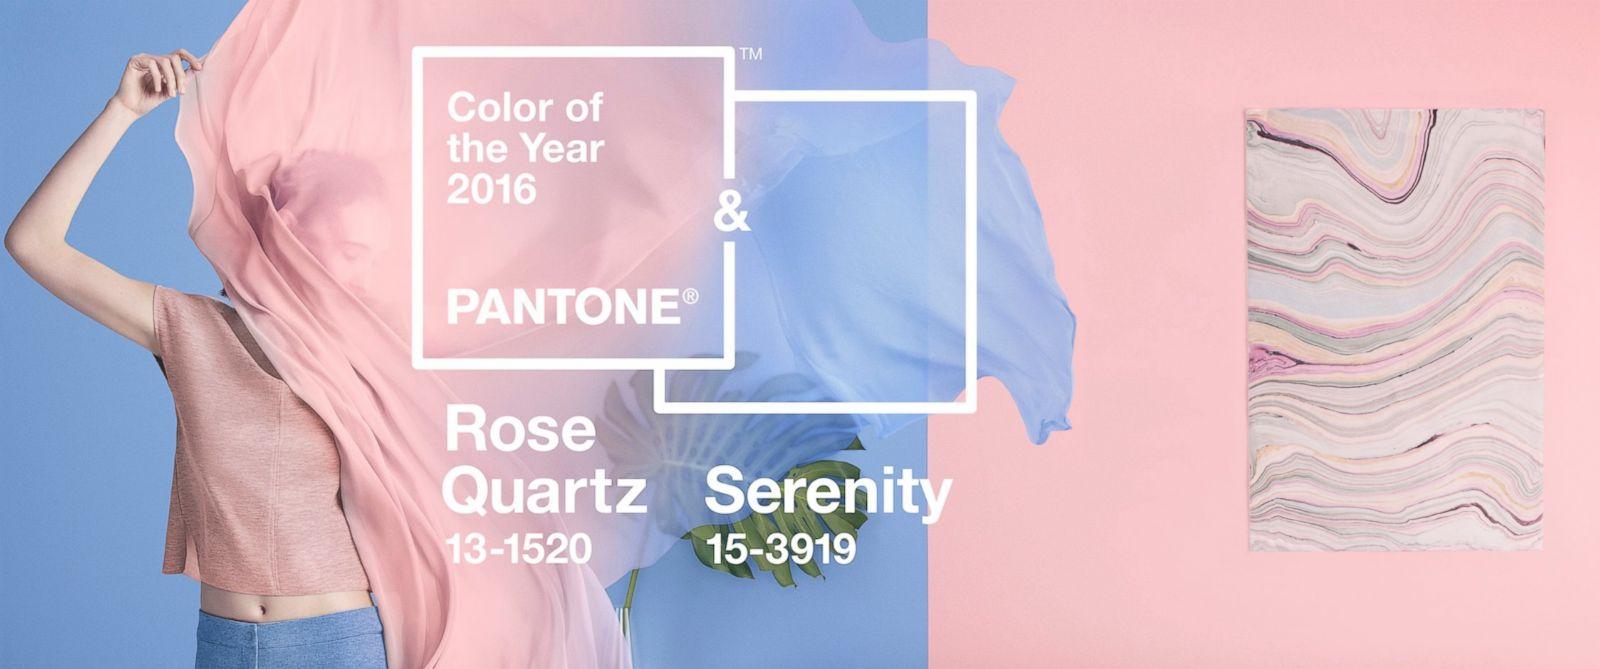 HT_pantone_color_cf_151202_12x5_1600